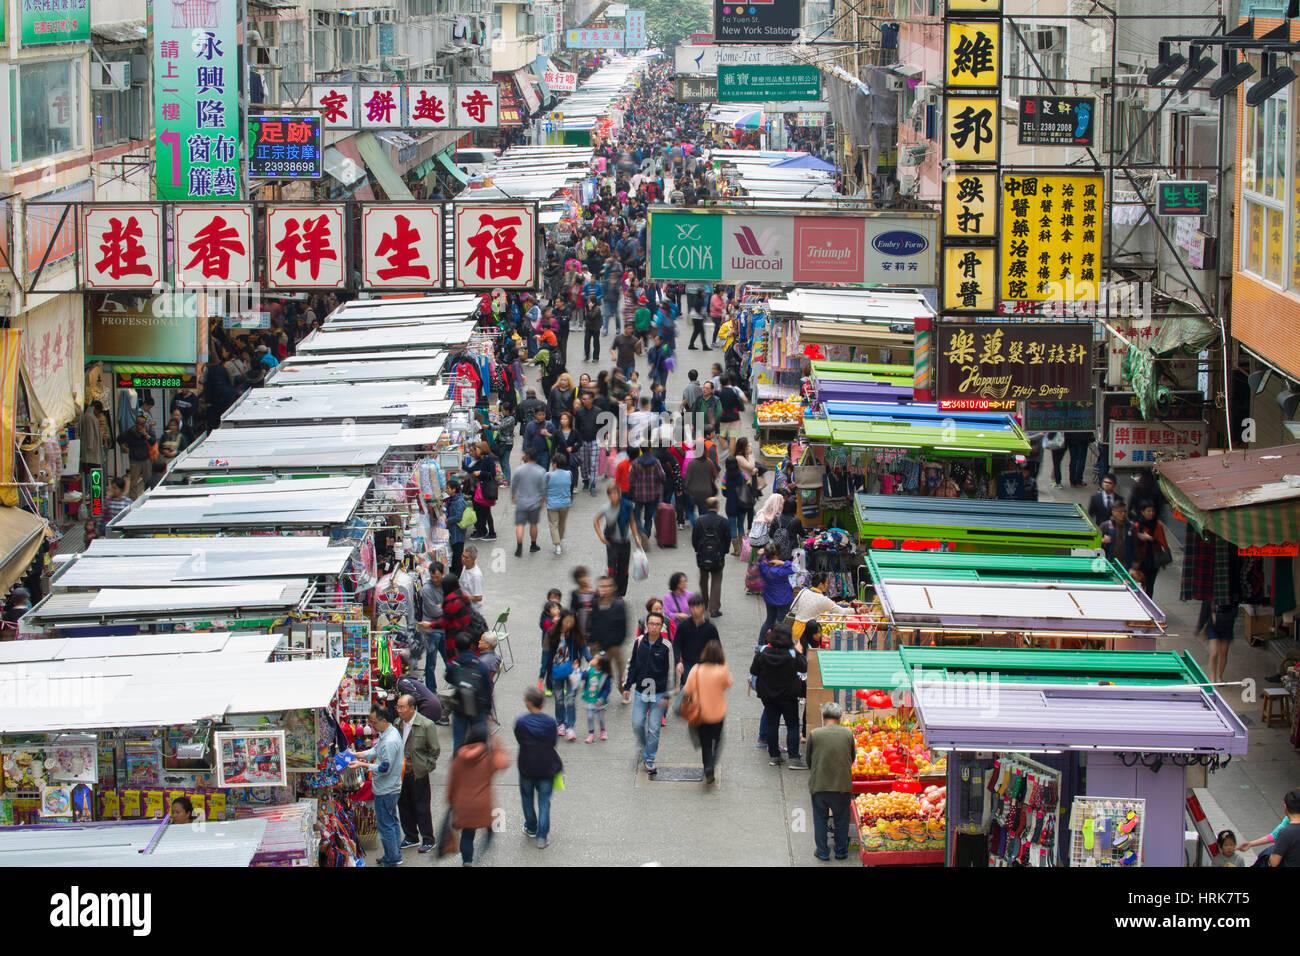 Fa Yuen Street Market, Mongkok, Kowloon, Hong Kong - Stock Image